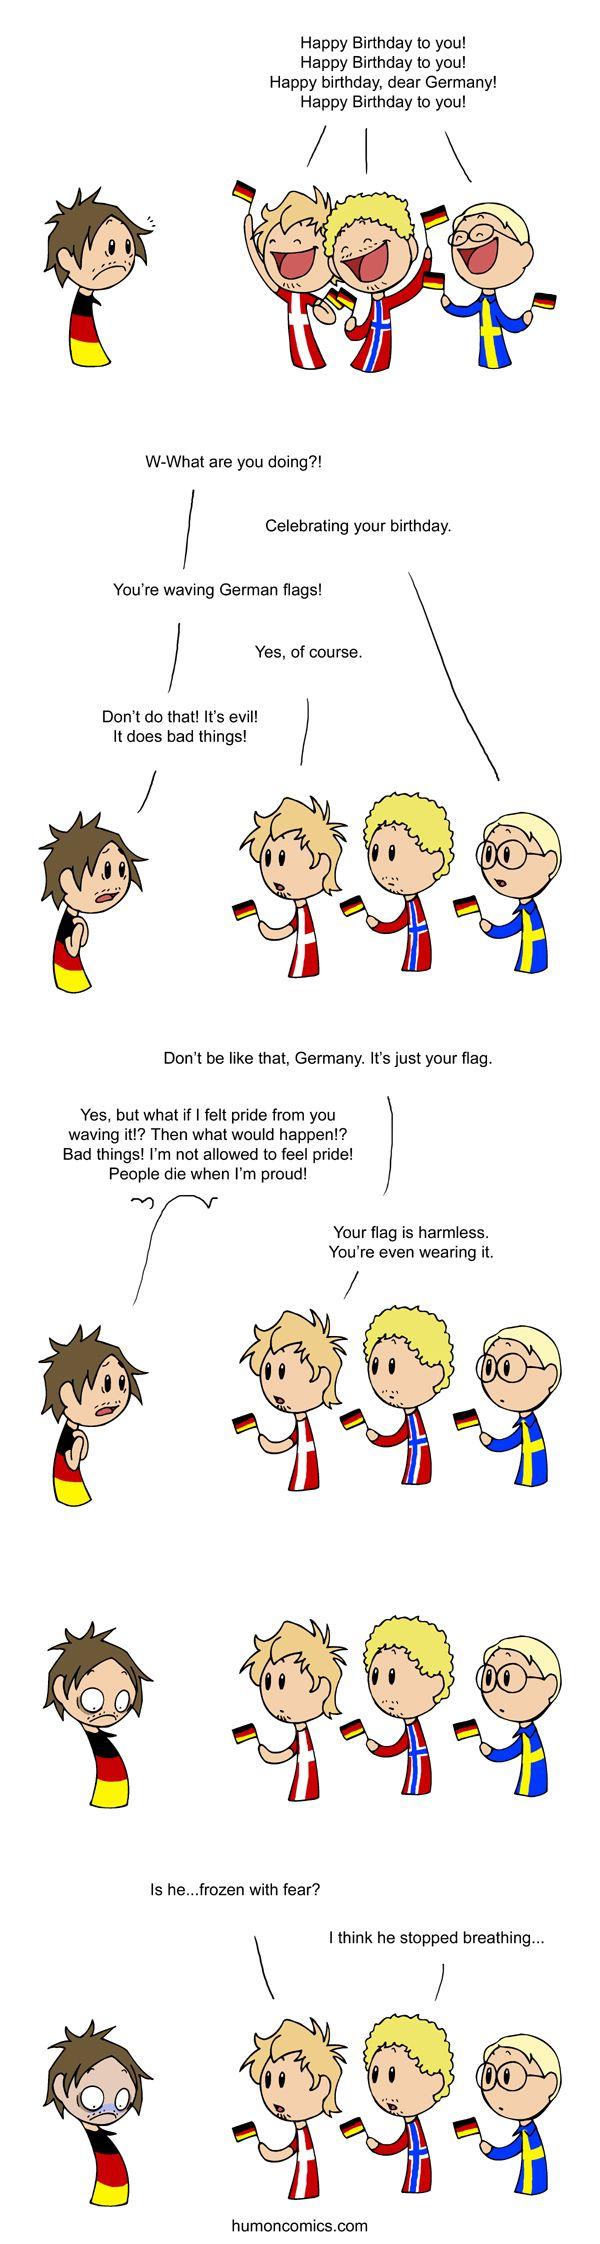 Haha, I just love the Germany jokes. Especially because they are oh so true...